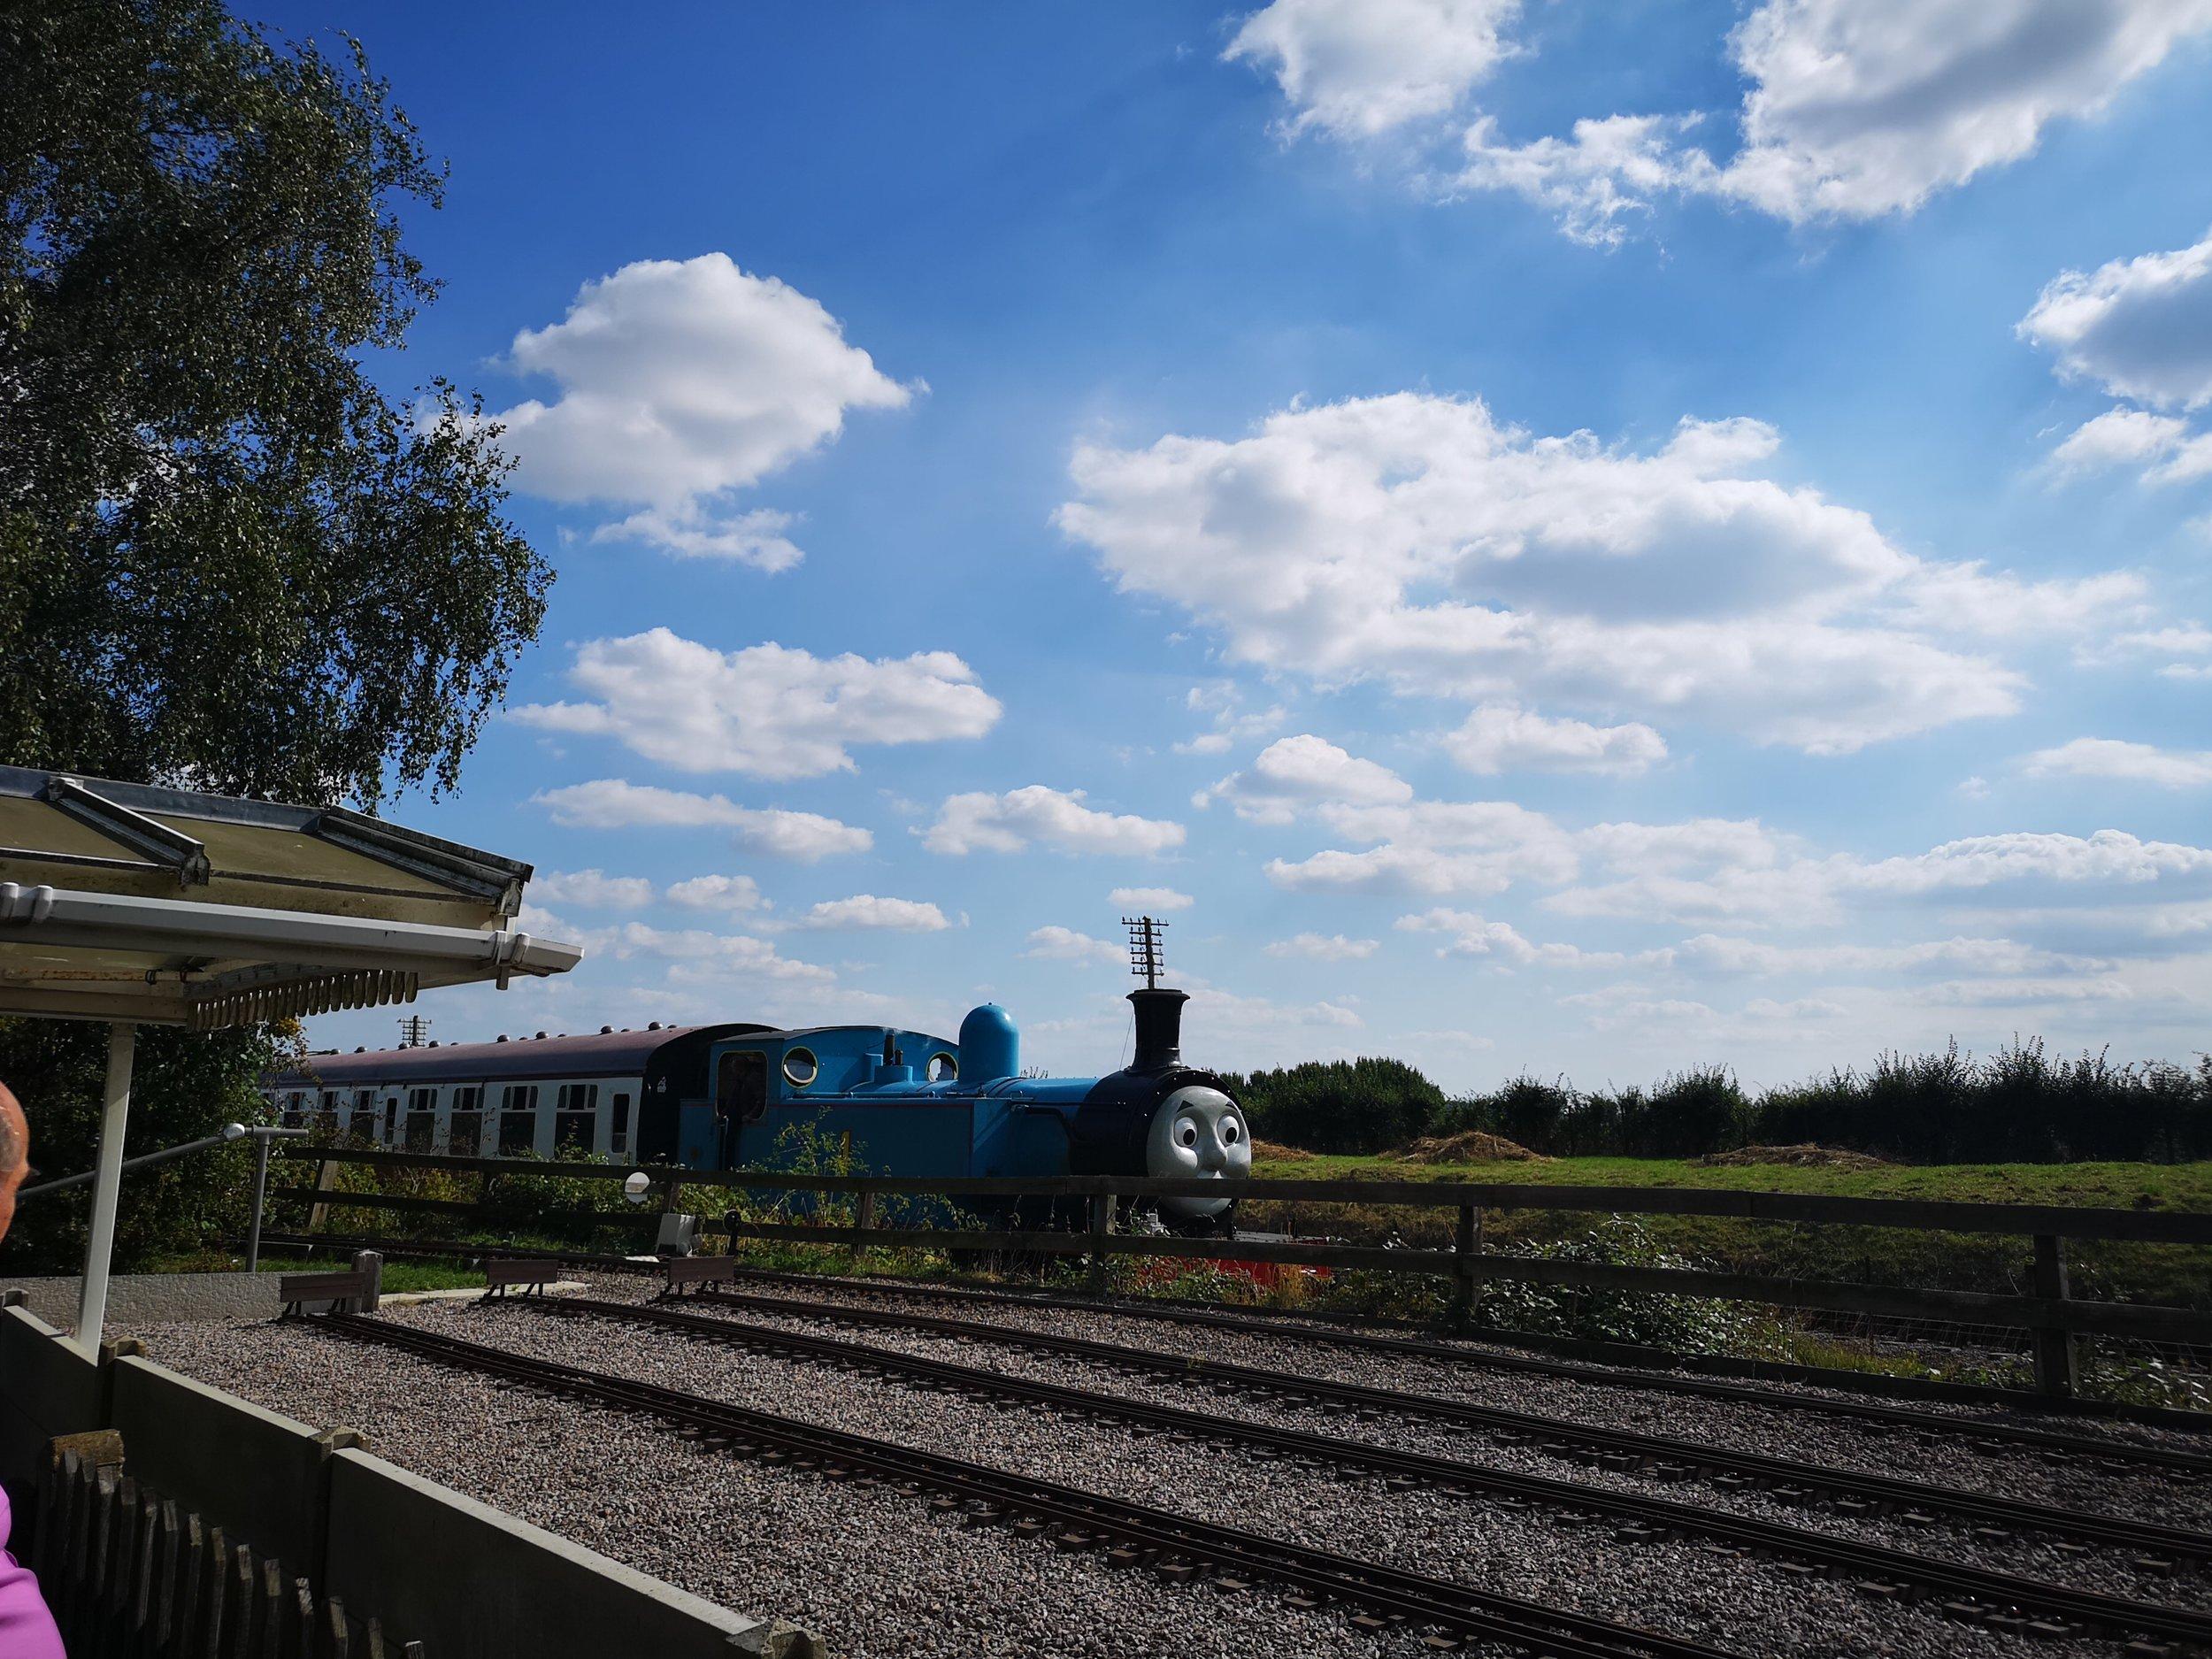 Buckinghamshire railway centre.